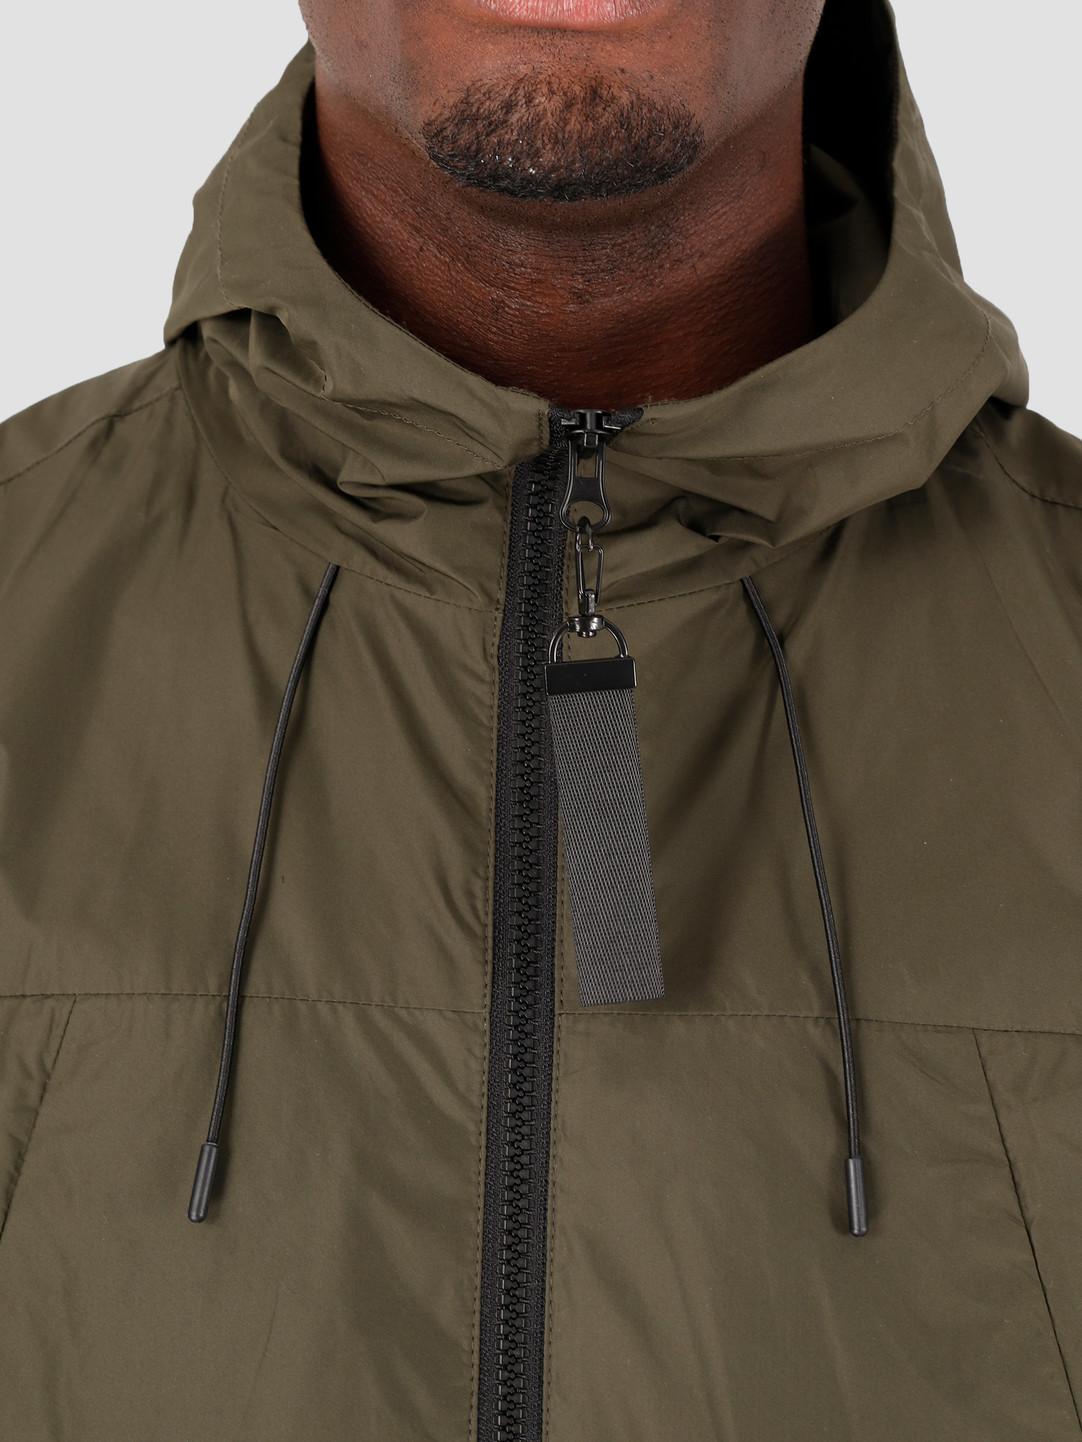 Quality Blanks Quality Blanks QB27 Windbreaker Jacket Military Green